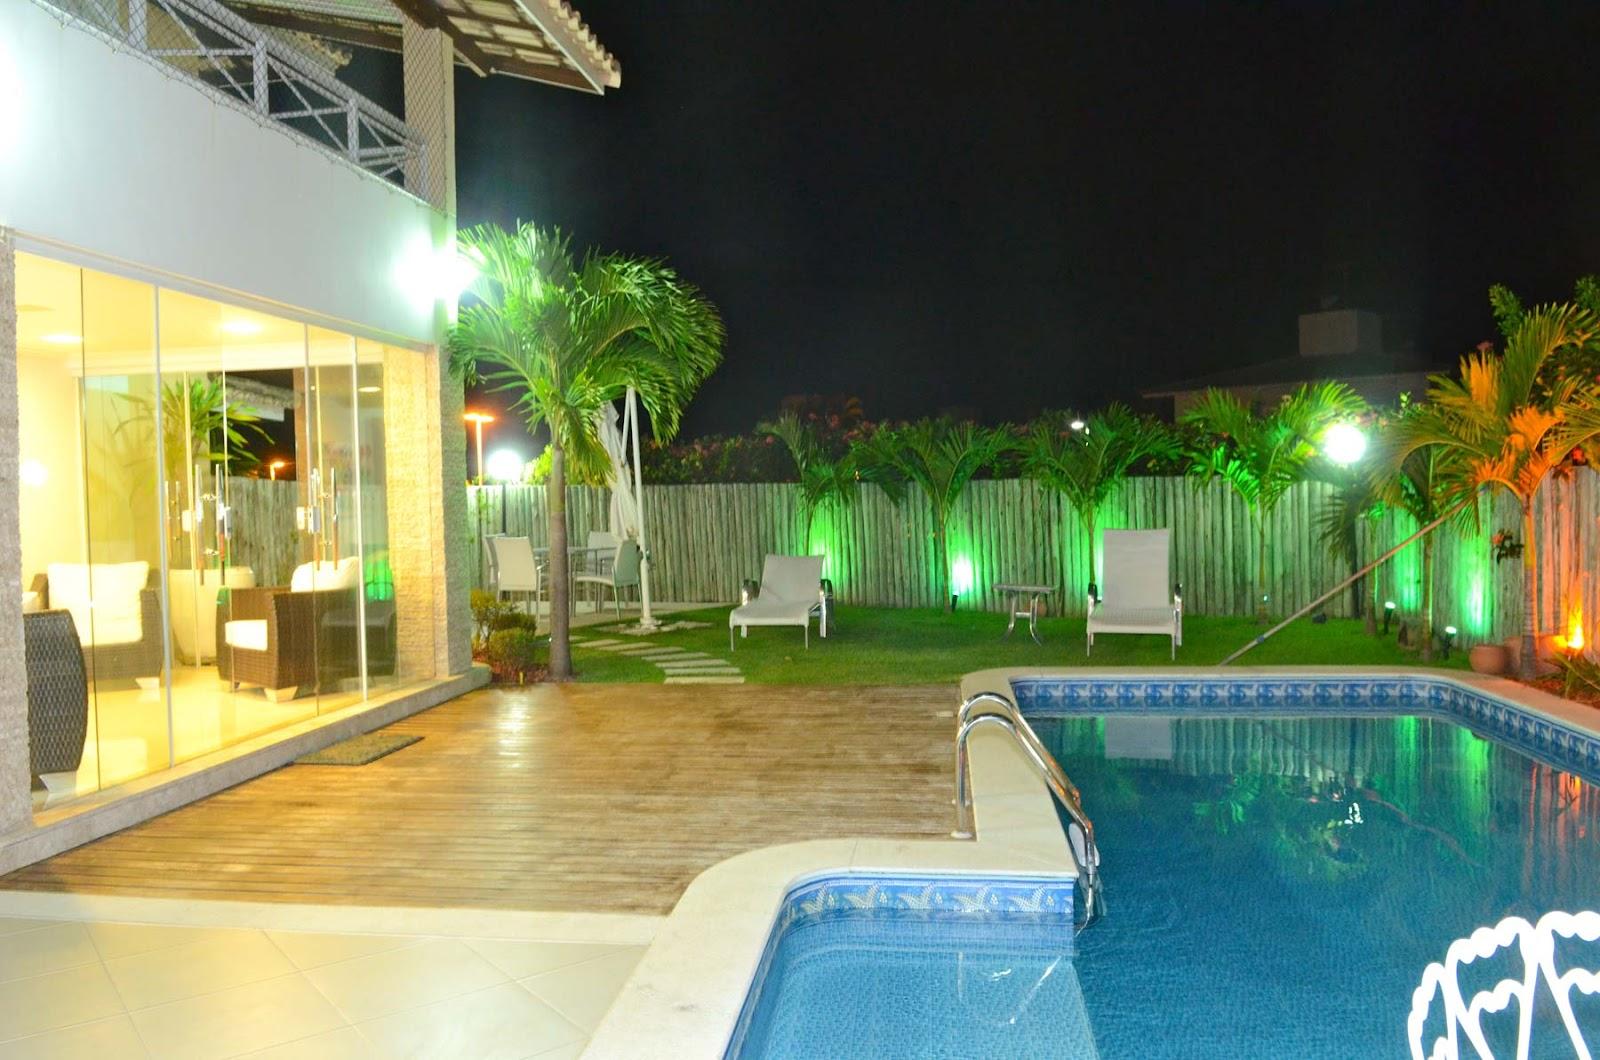 iluminacao led jardins: para jardins confira fotos de meios de iluminar jardins voltar